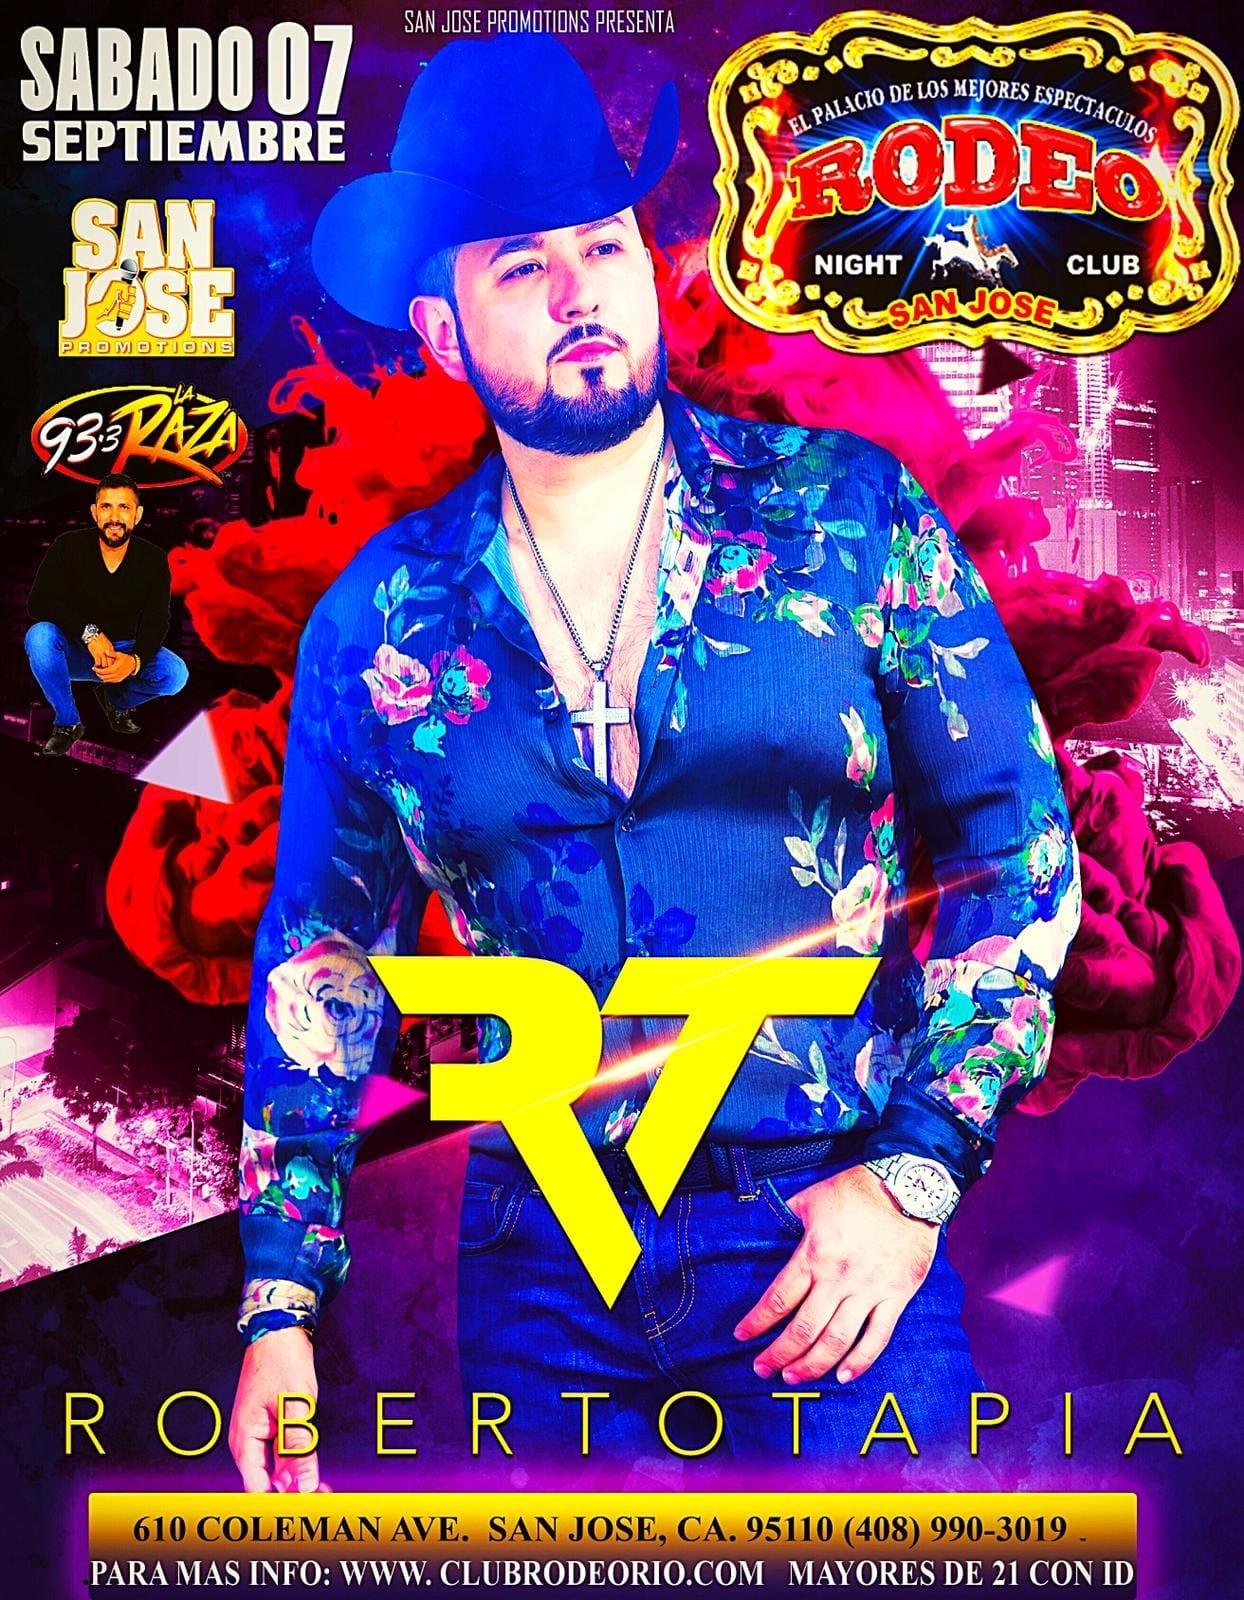 Roberto Tapia Sabado 7 De Septiembre Club Rodeo De San Jose